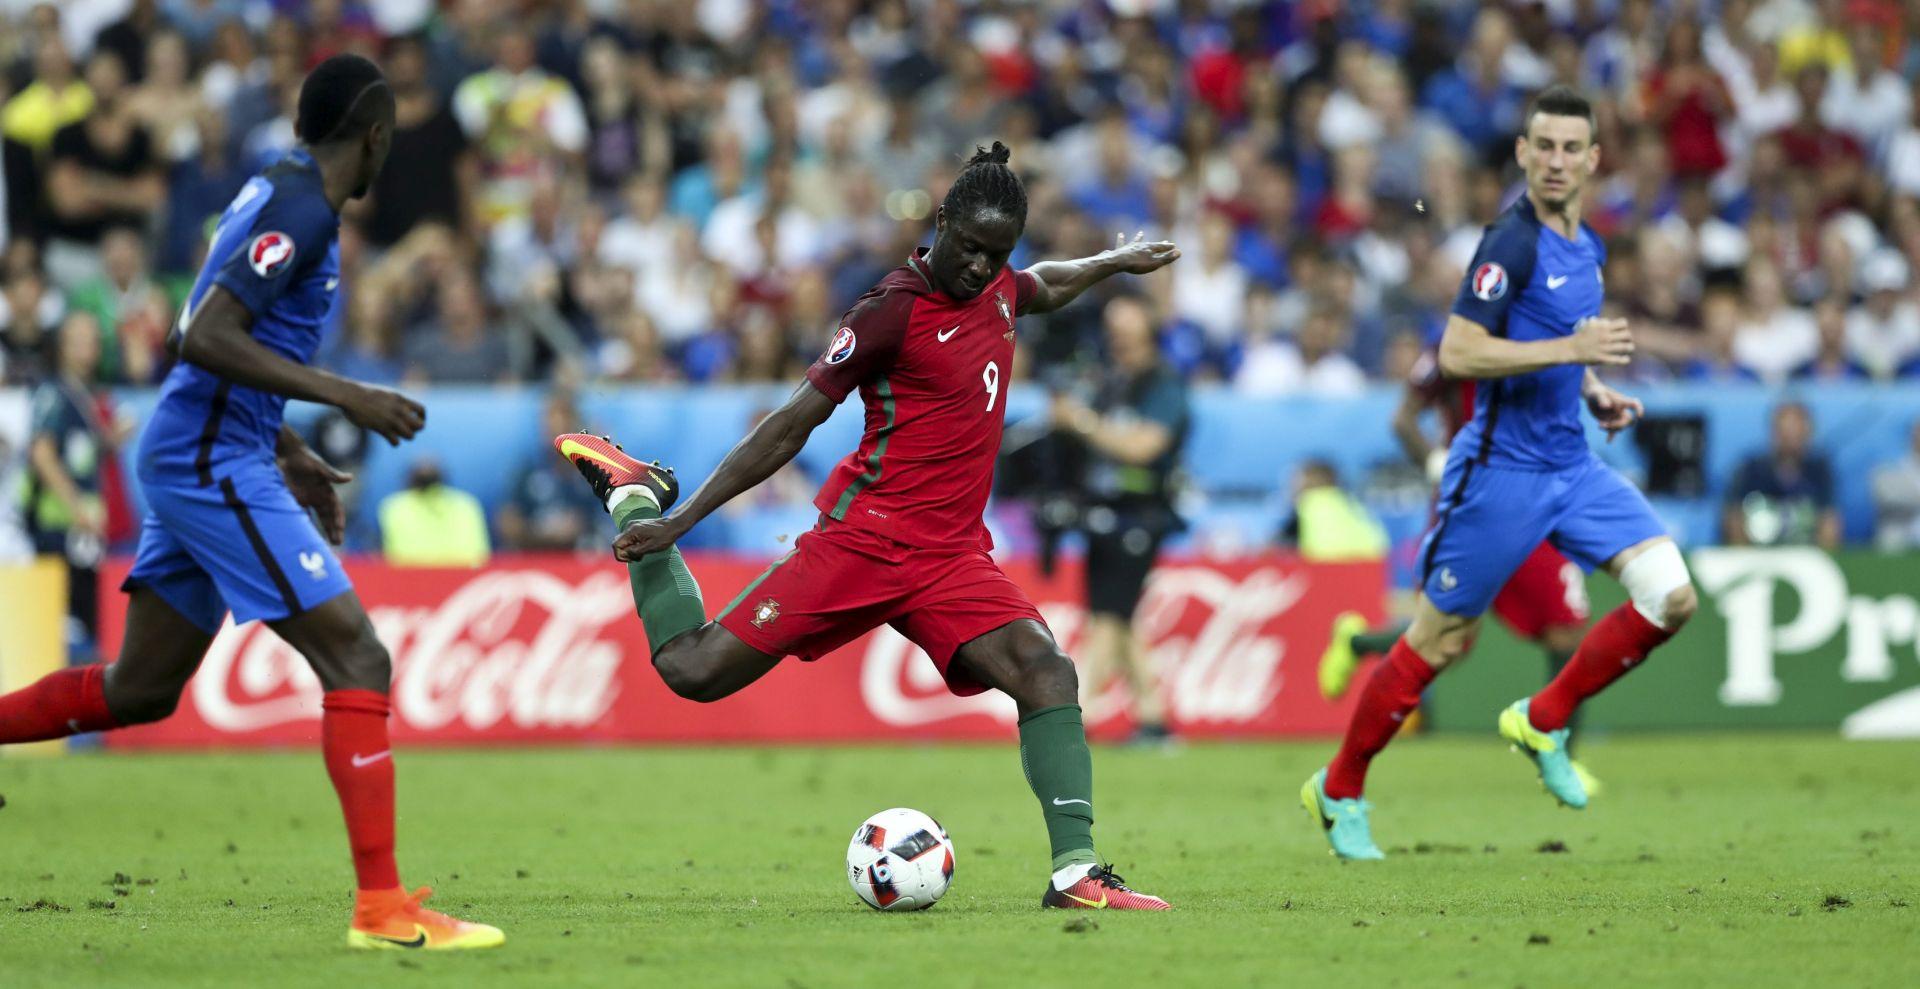 NOVI PORTUGALSKI JUNAK Tko je Santosov 'jocker' Edér?